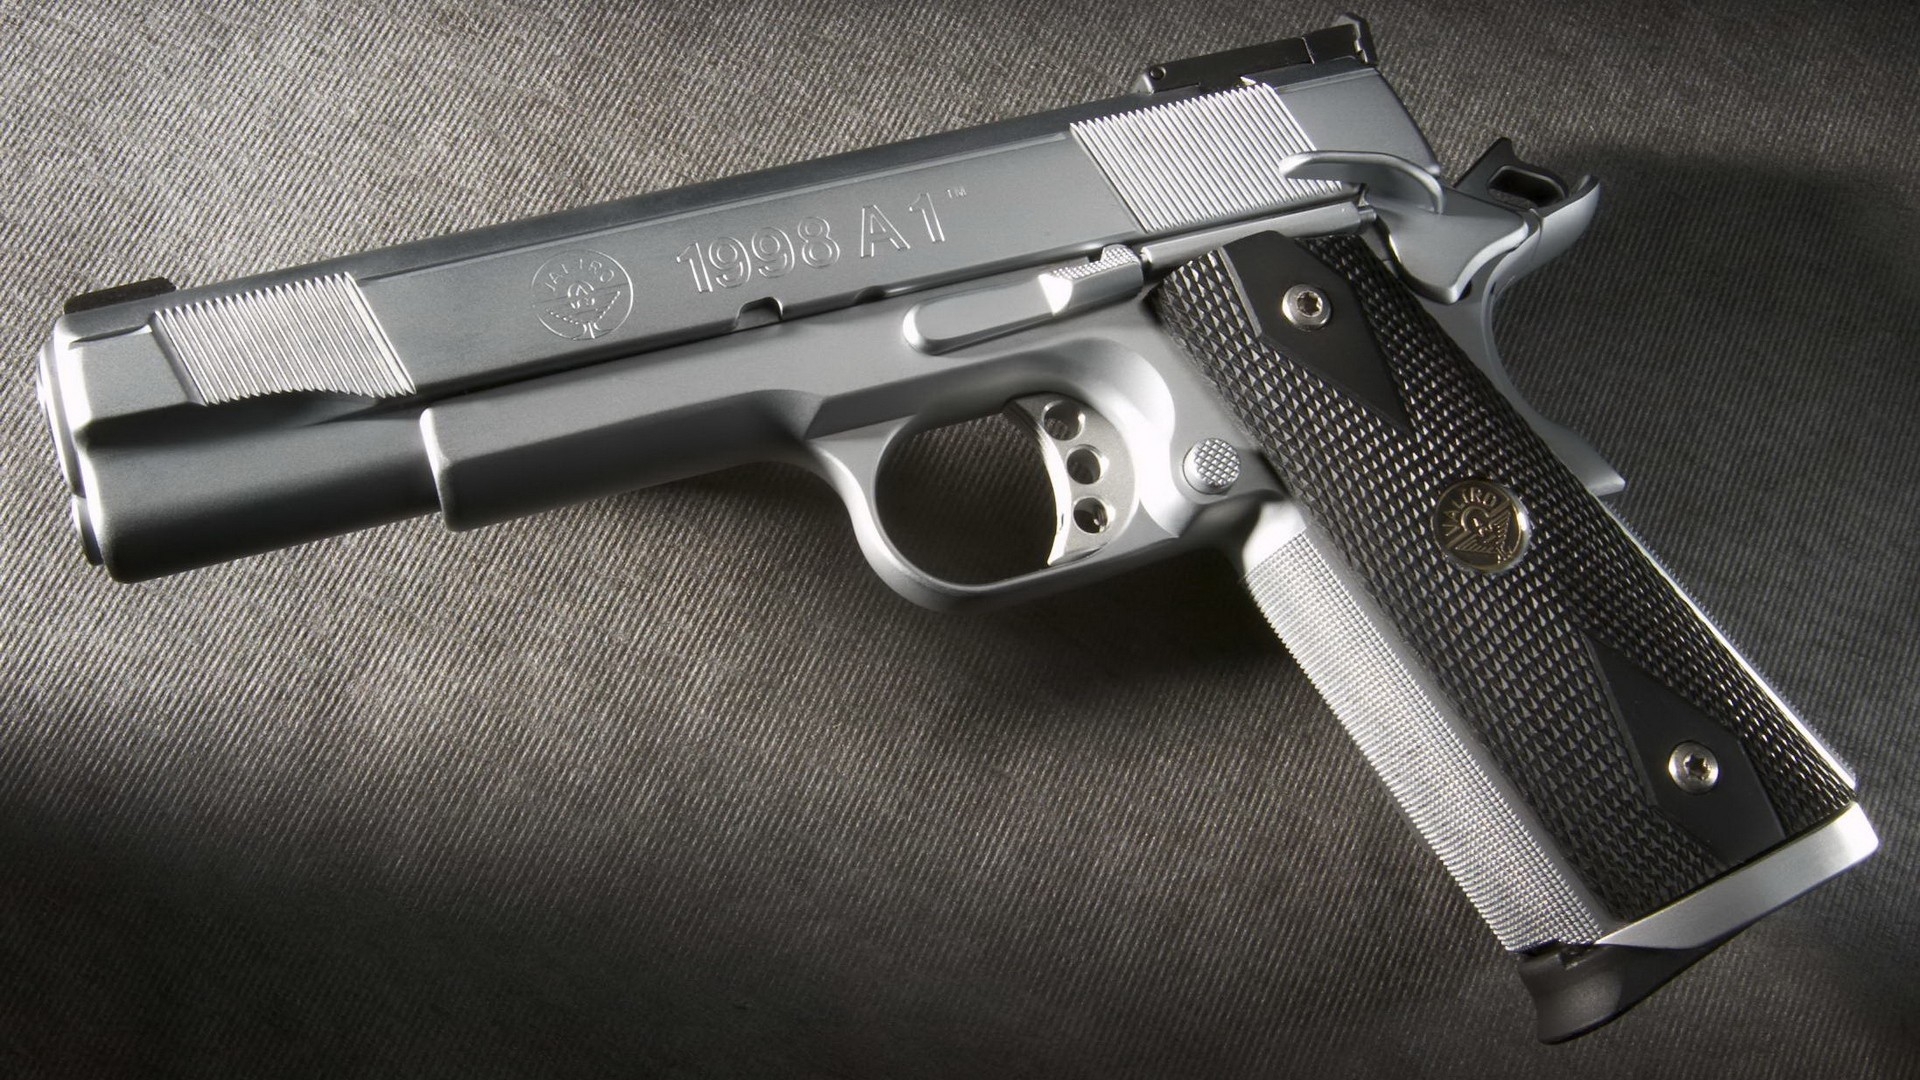 Download Pistols Guns Wallpaper 1920x1080 | Wallpoper #277500